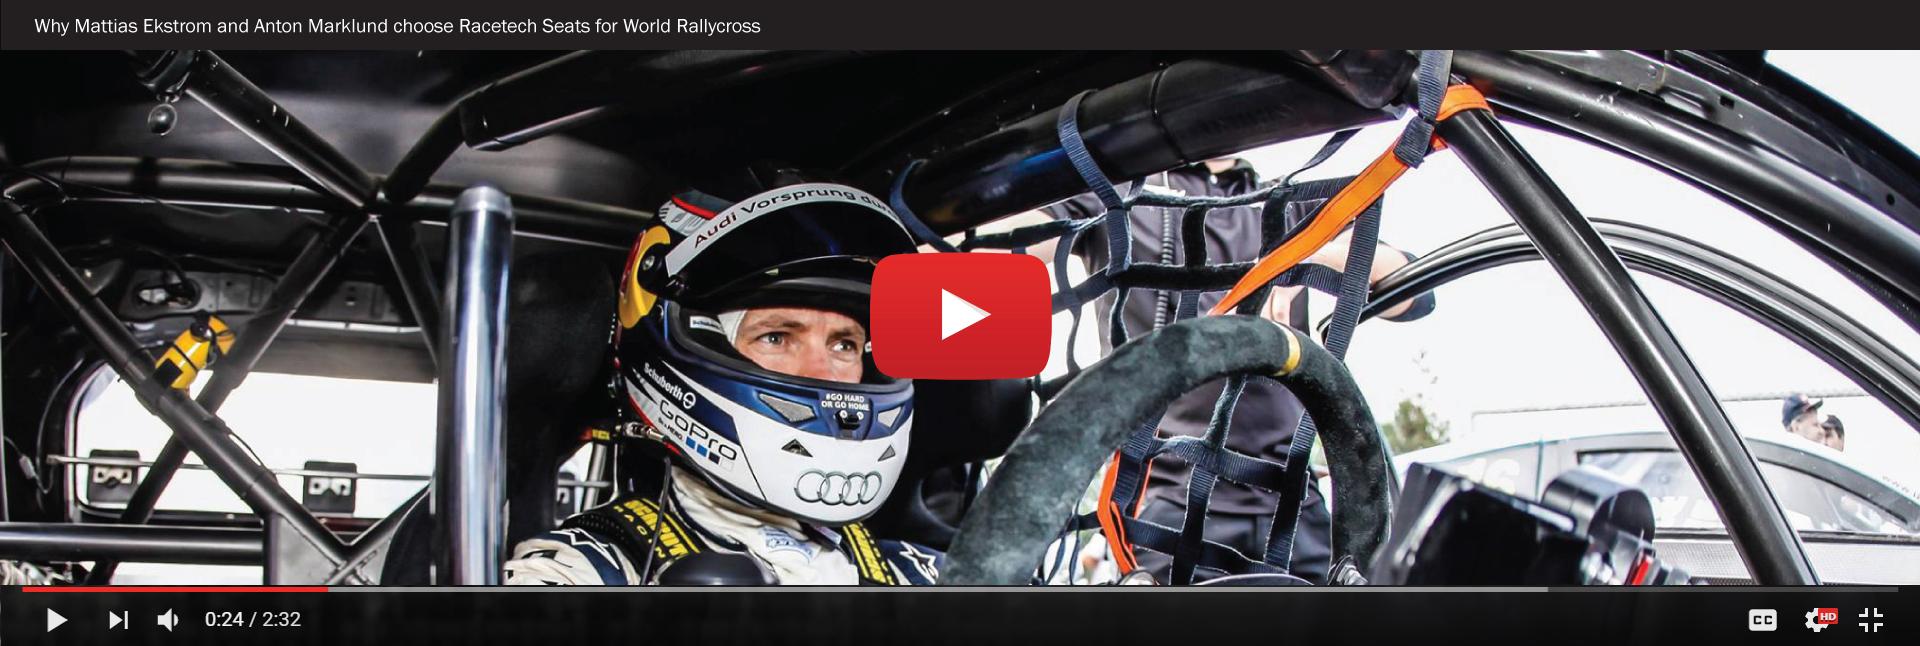 EKSRX Choose Racetech